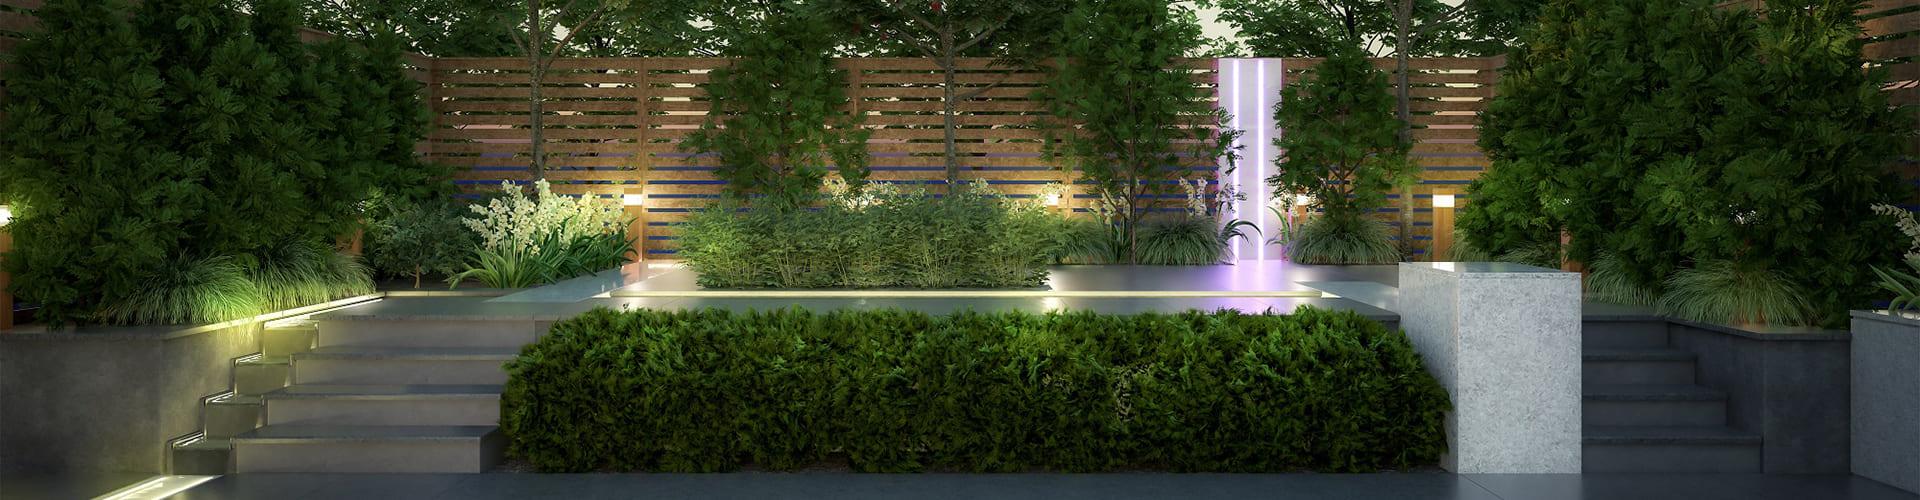 Garten- und Landschaftsbau - Garten- und Landschaftsbau Korpala